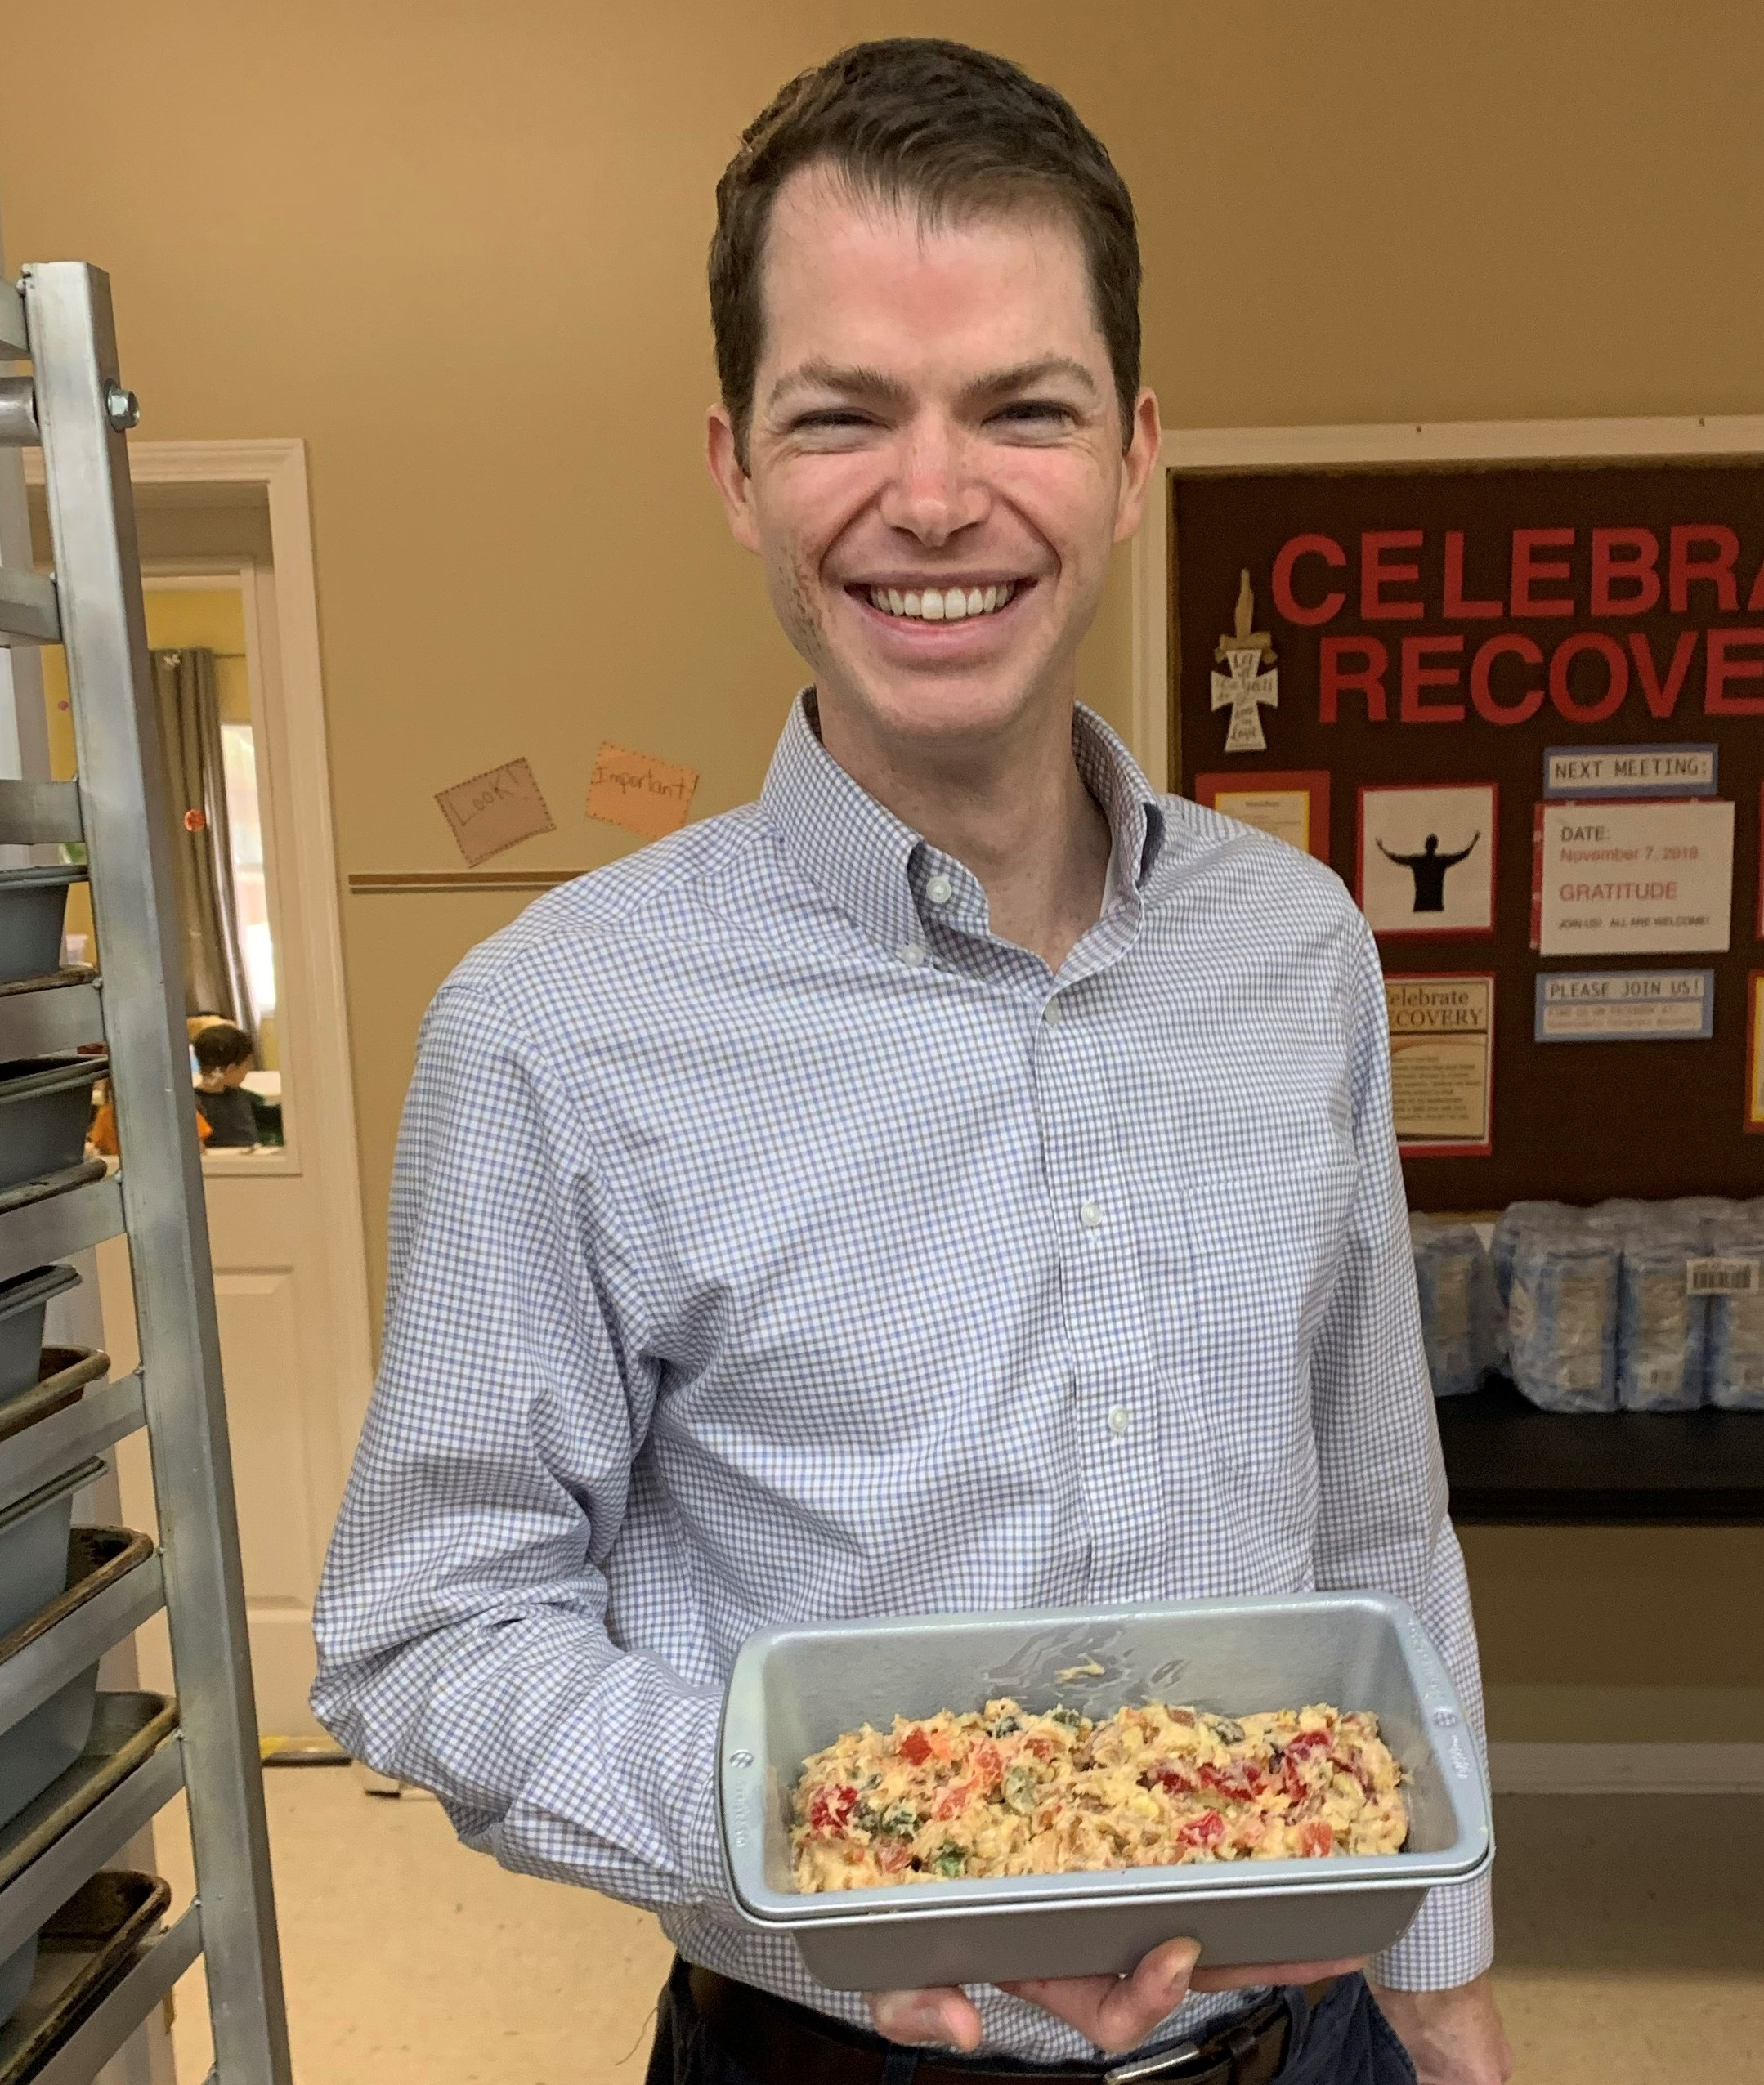 The Rev. Jonathan Hart of Robertsdale United Methodist Church in Alabama prepares to bake his fruitcake.